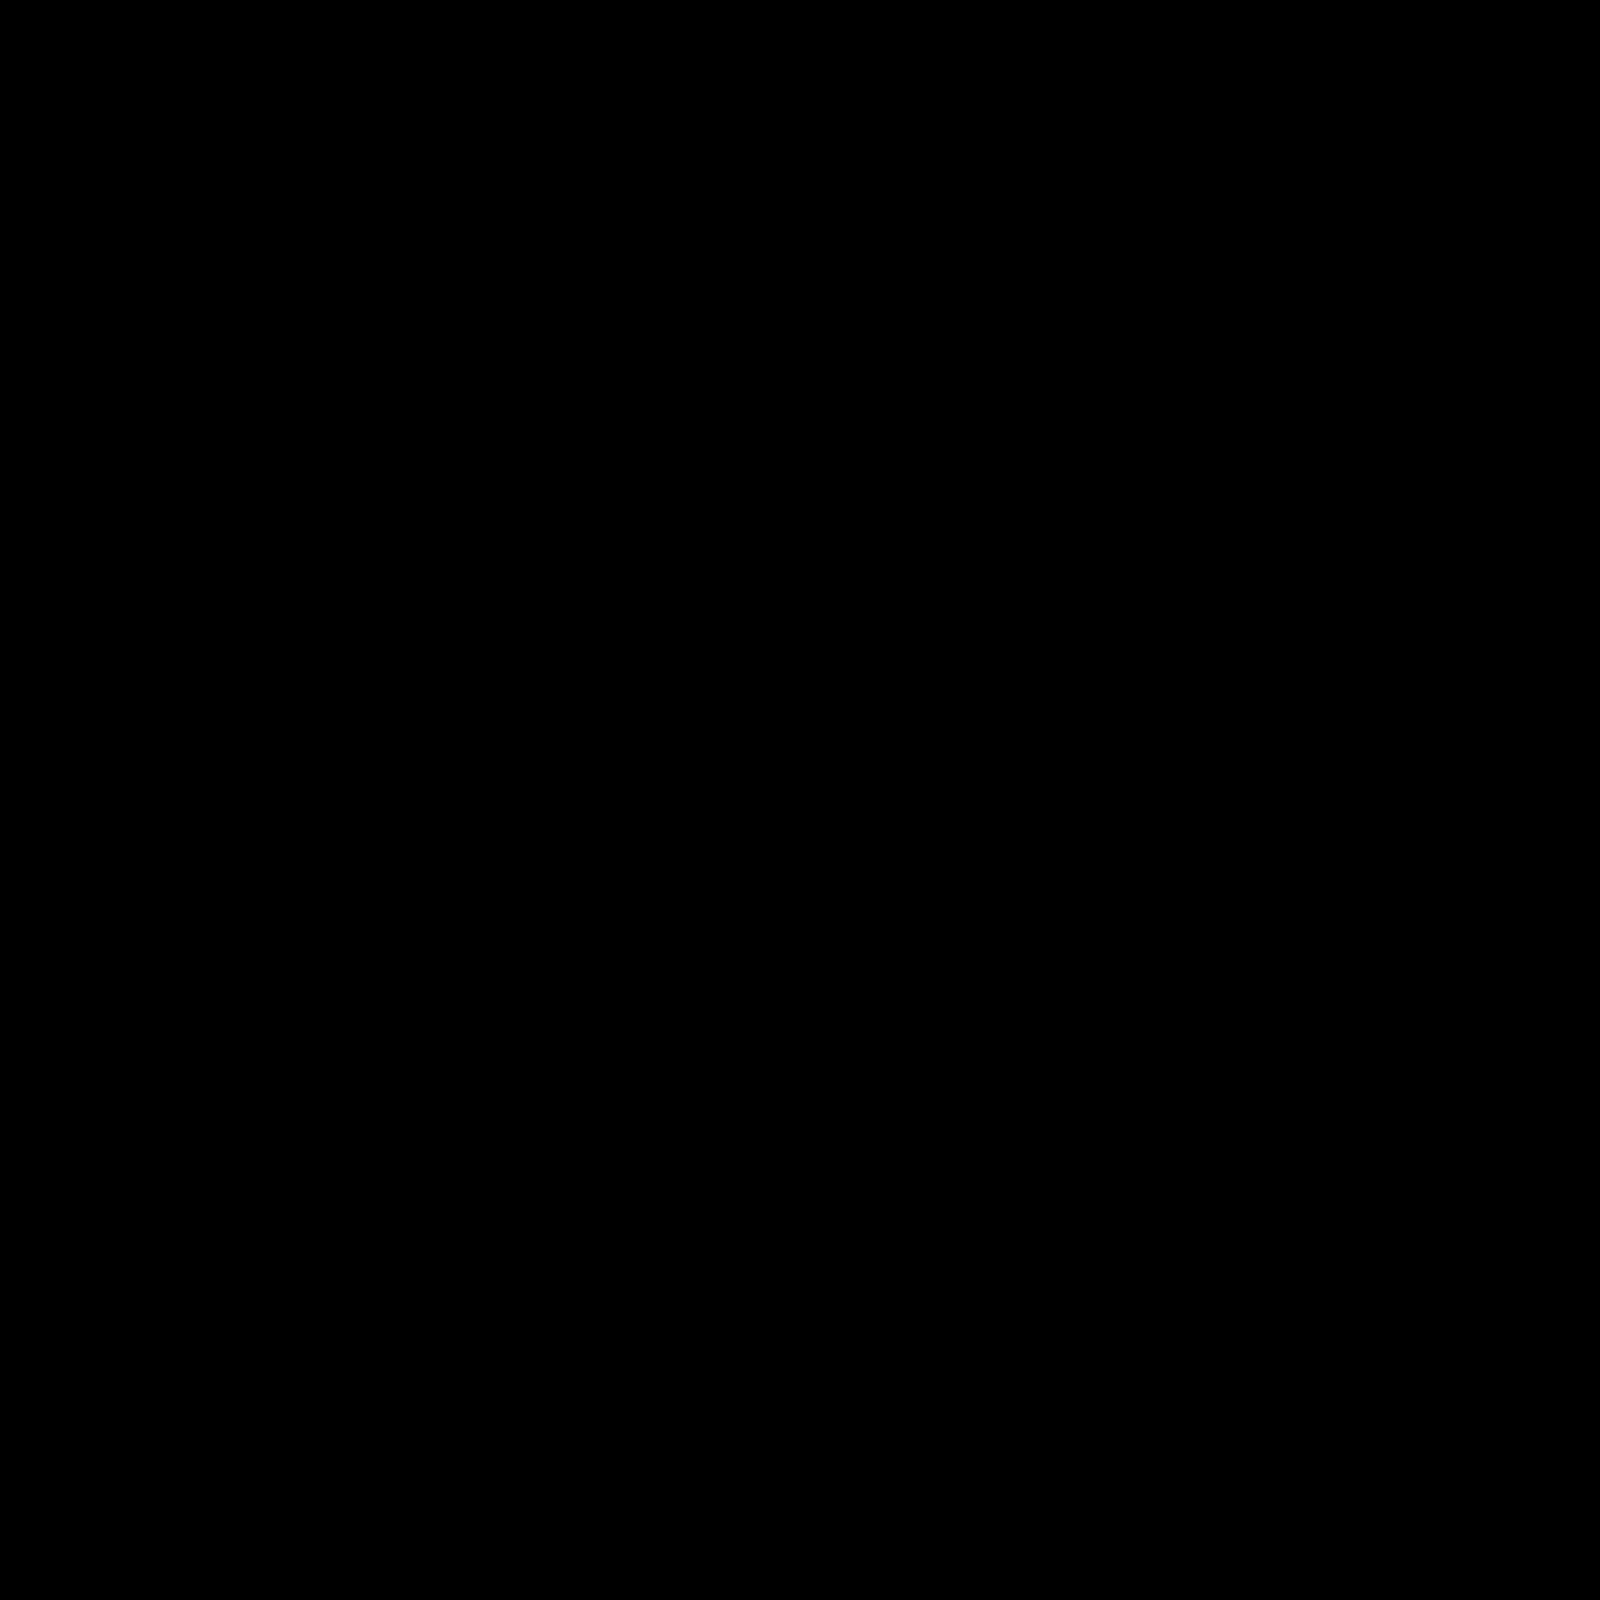 Sax Filled icon